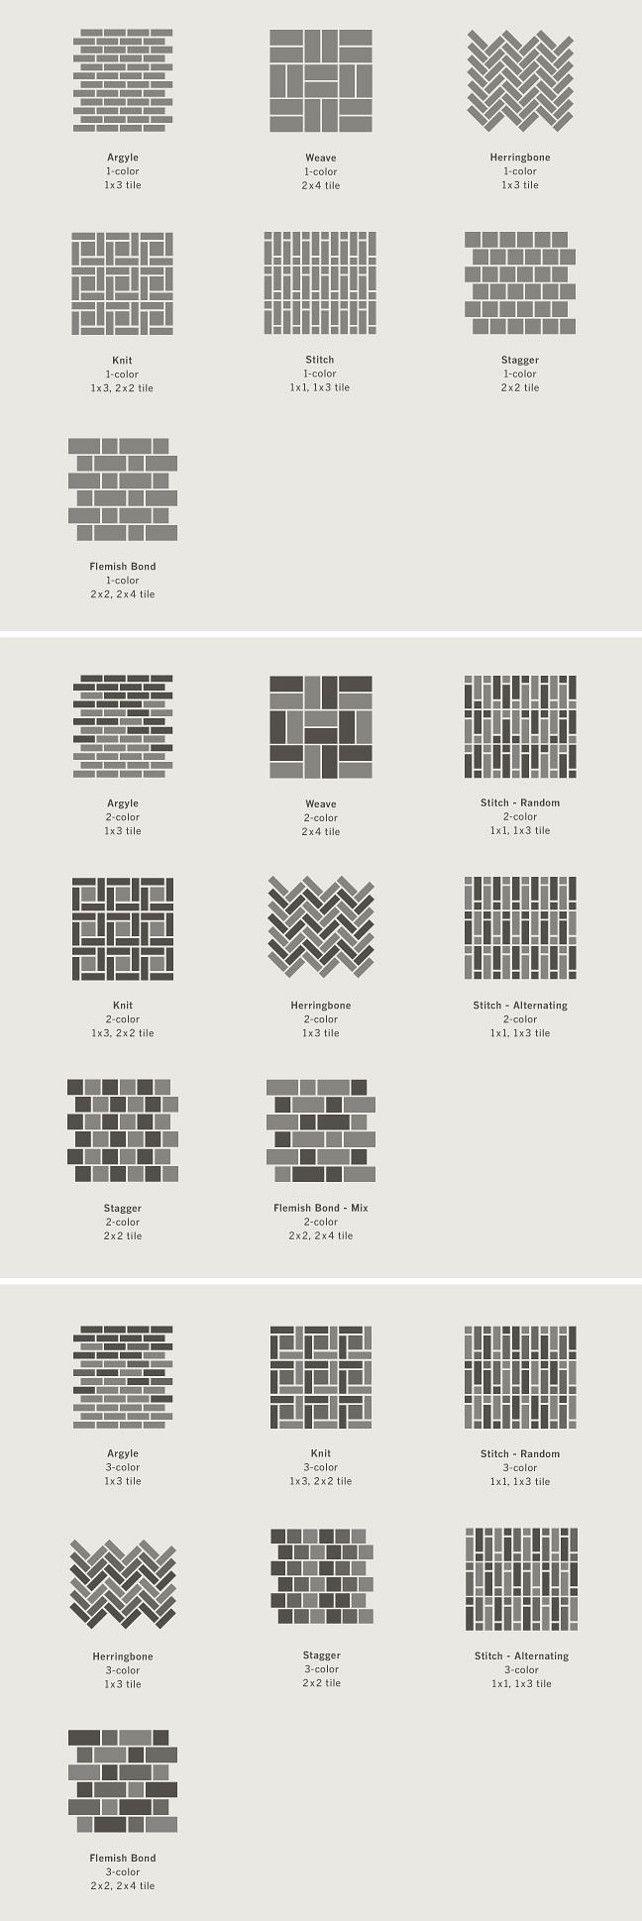 Kitchen Tiles Layout Ideas tiling layout patterns. tile layout. tiling layout ideas. great